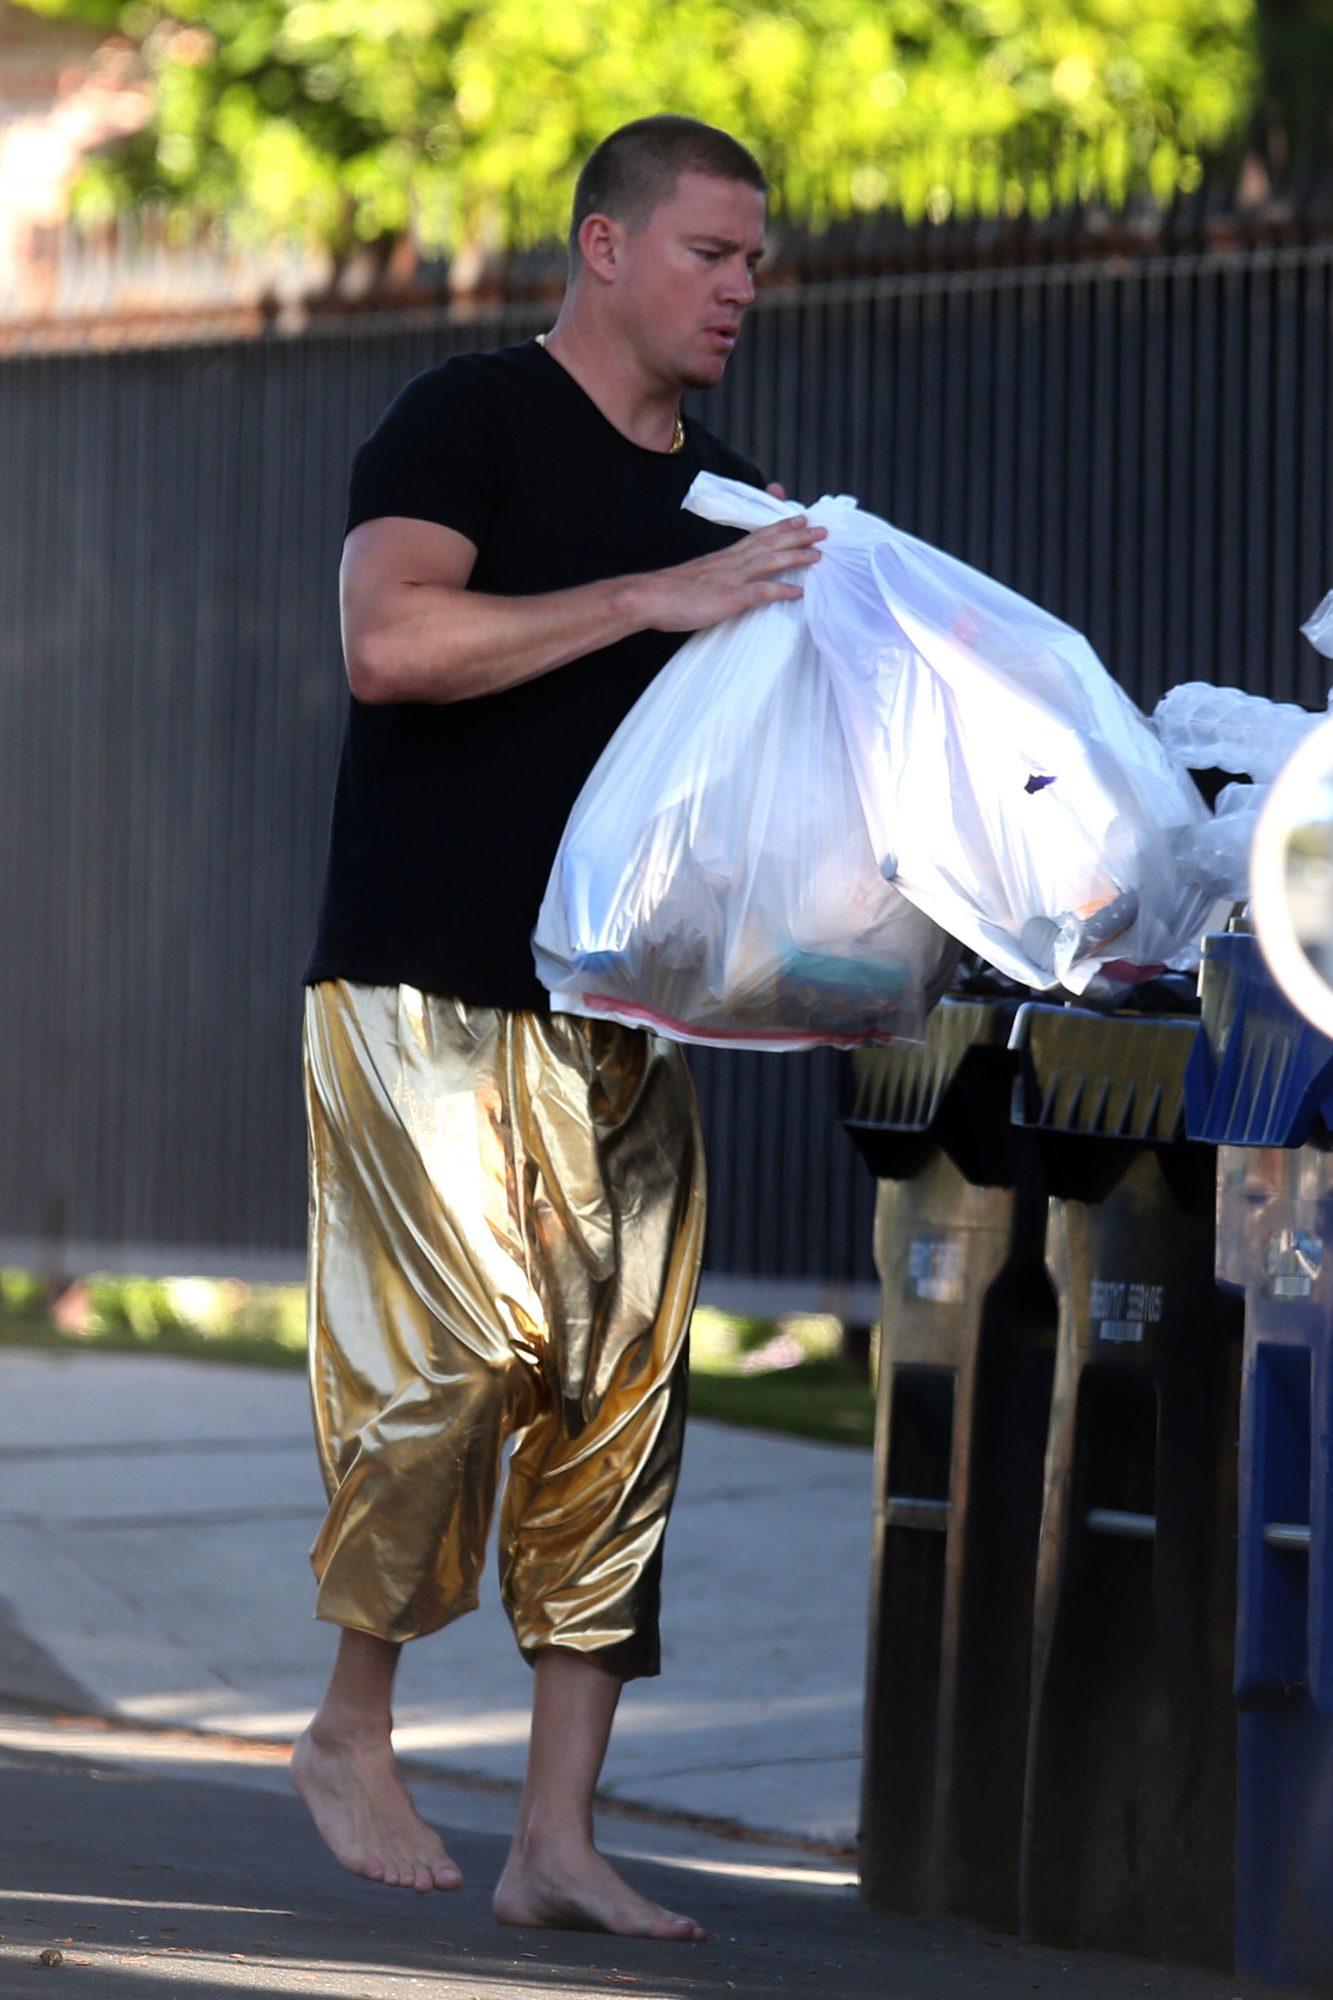 channing tatum sin zapatos sacando basura pantalones dorados cuarentena